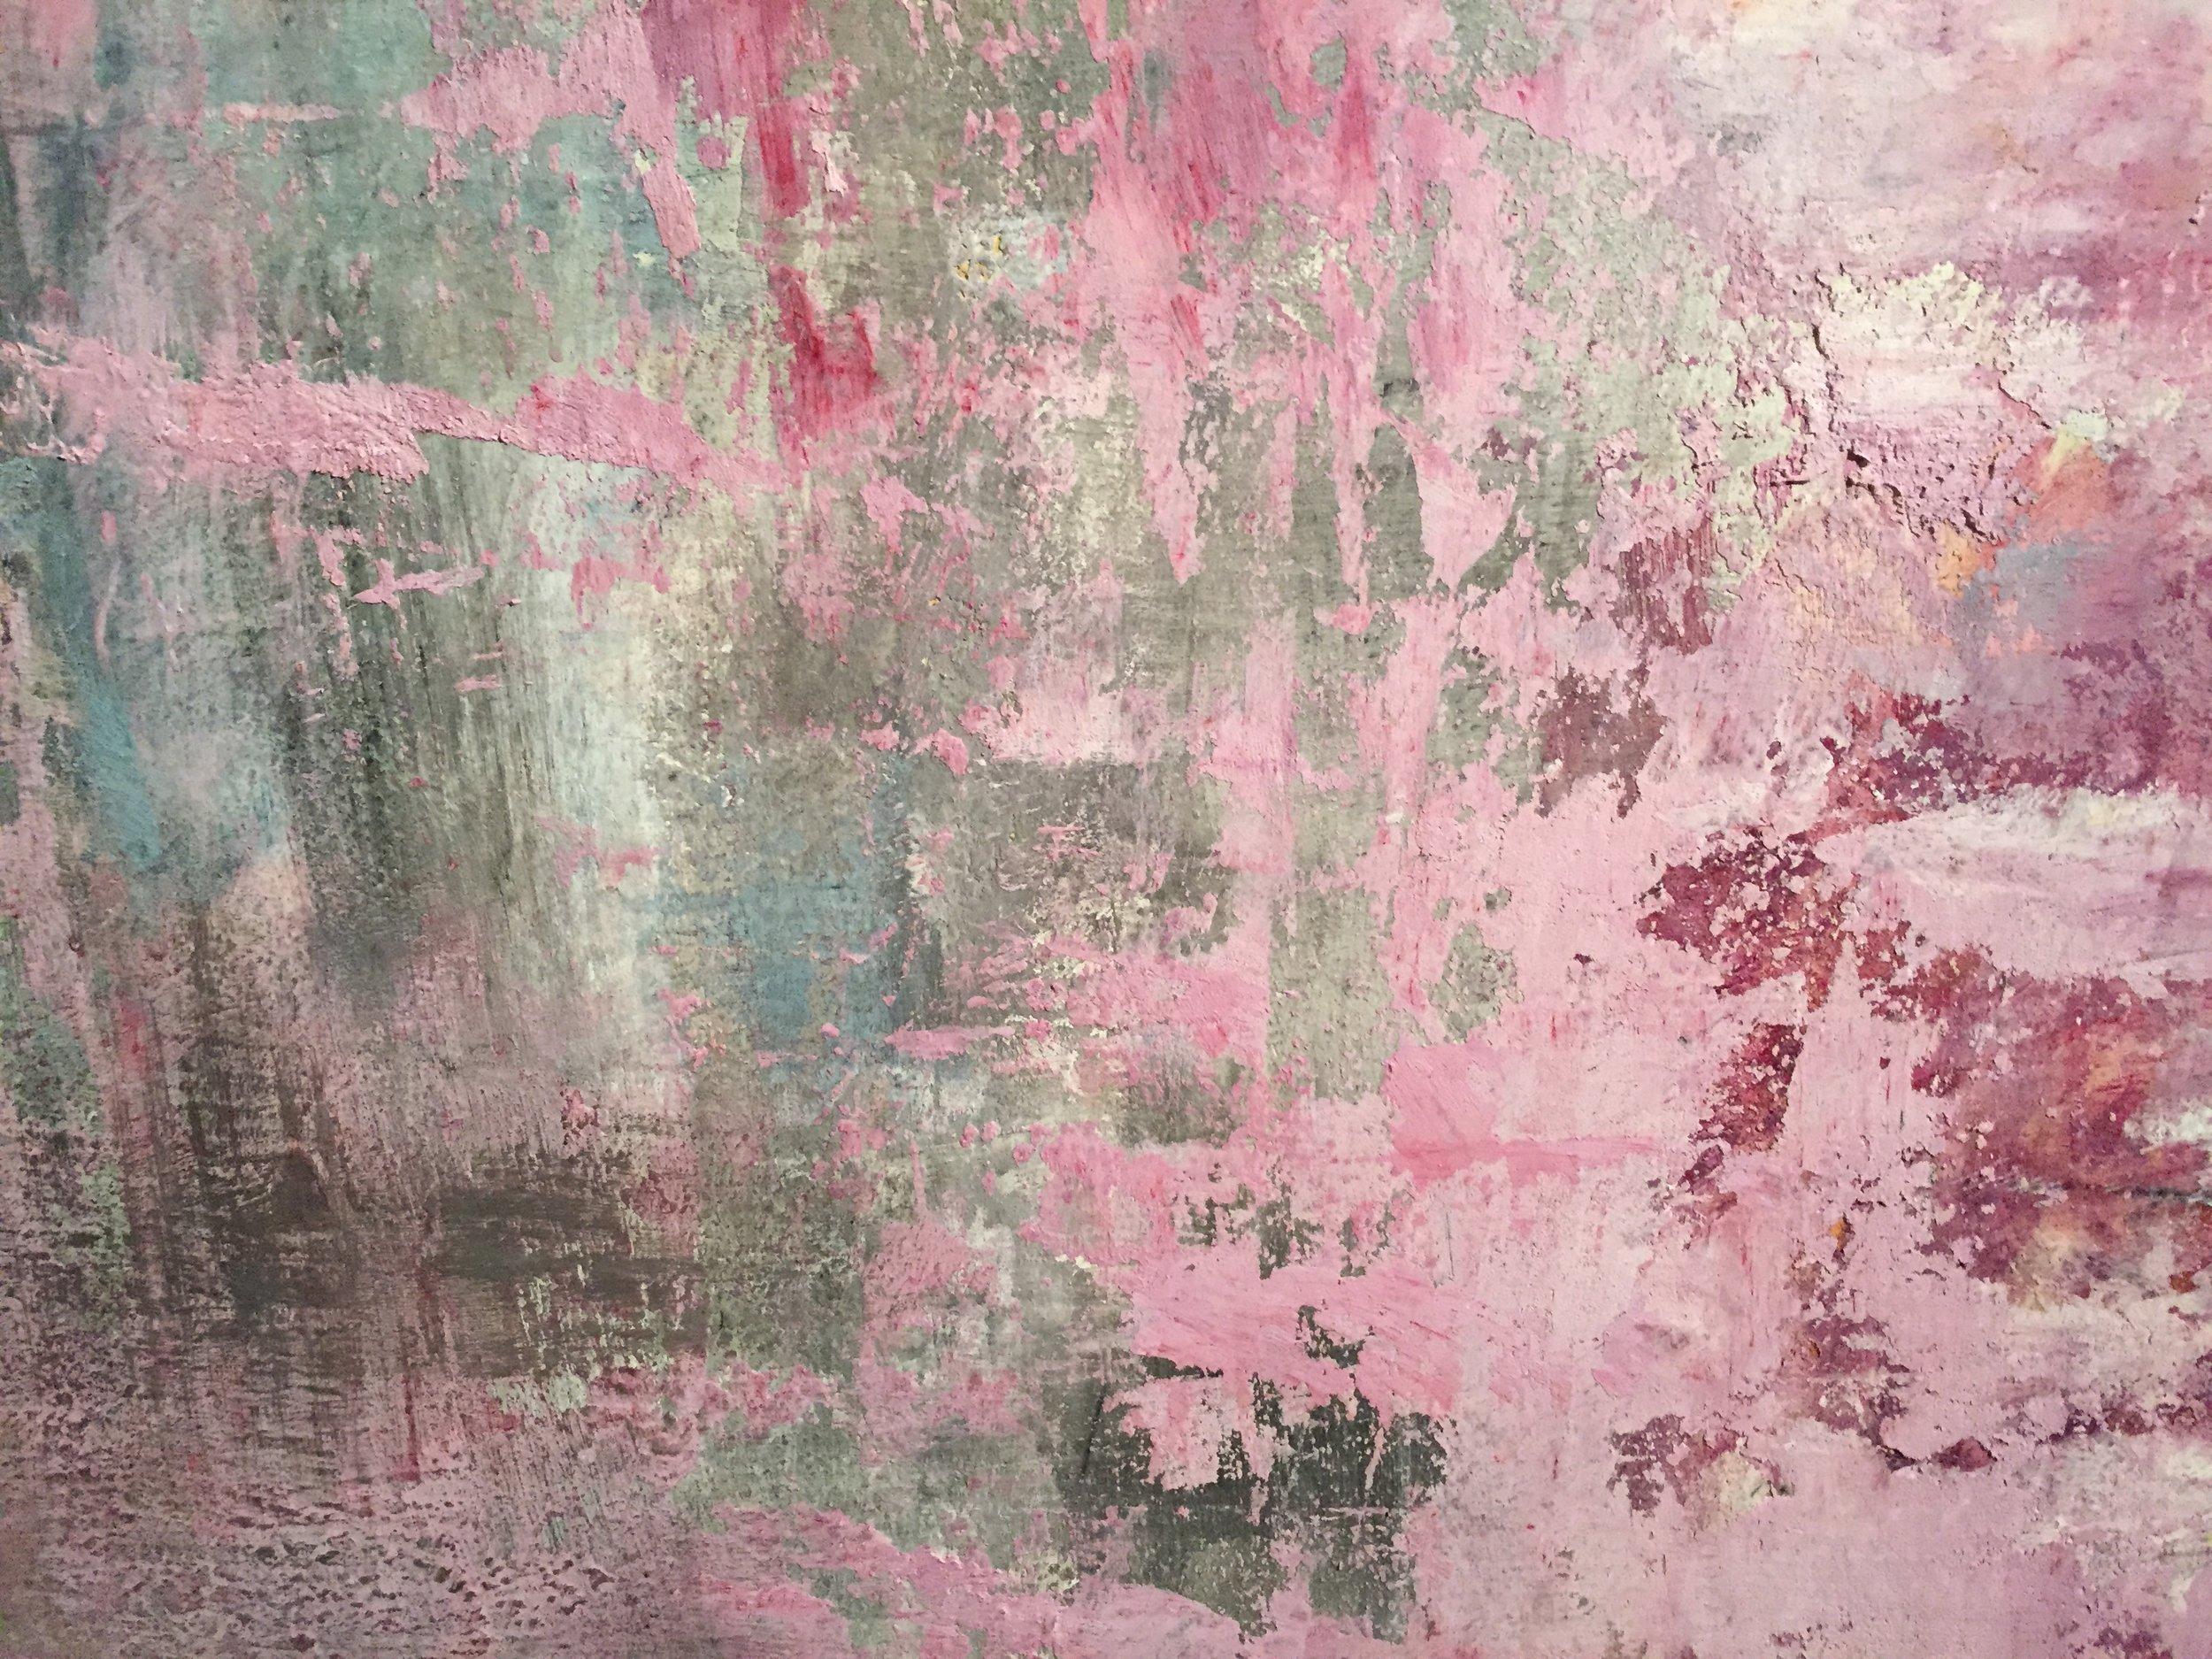 Detail, Miji House Wall